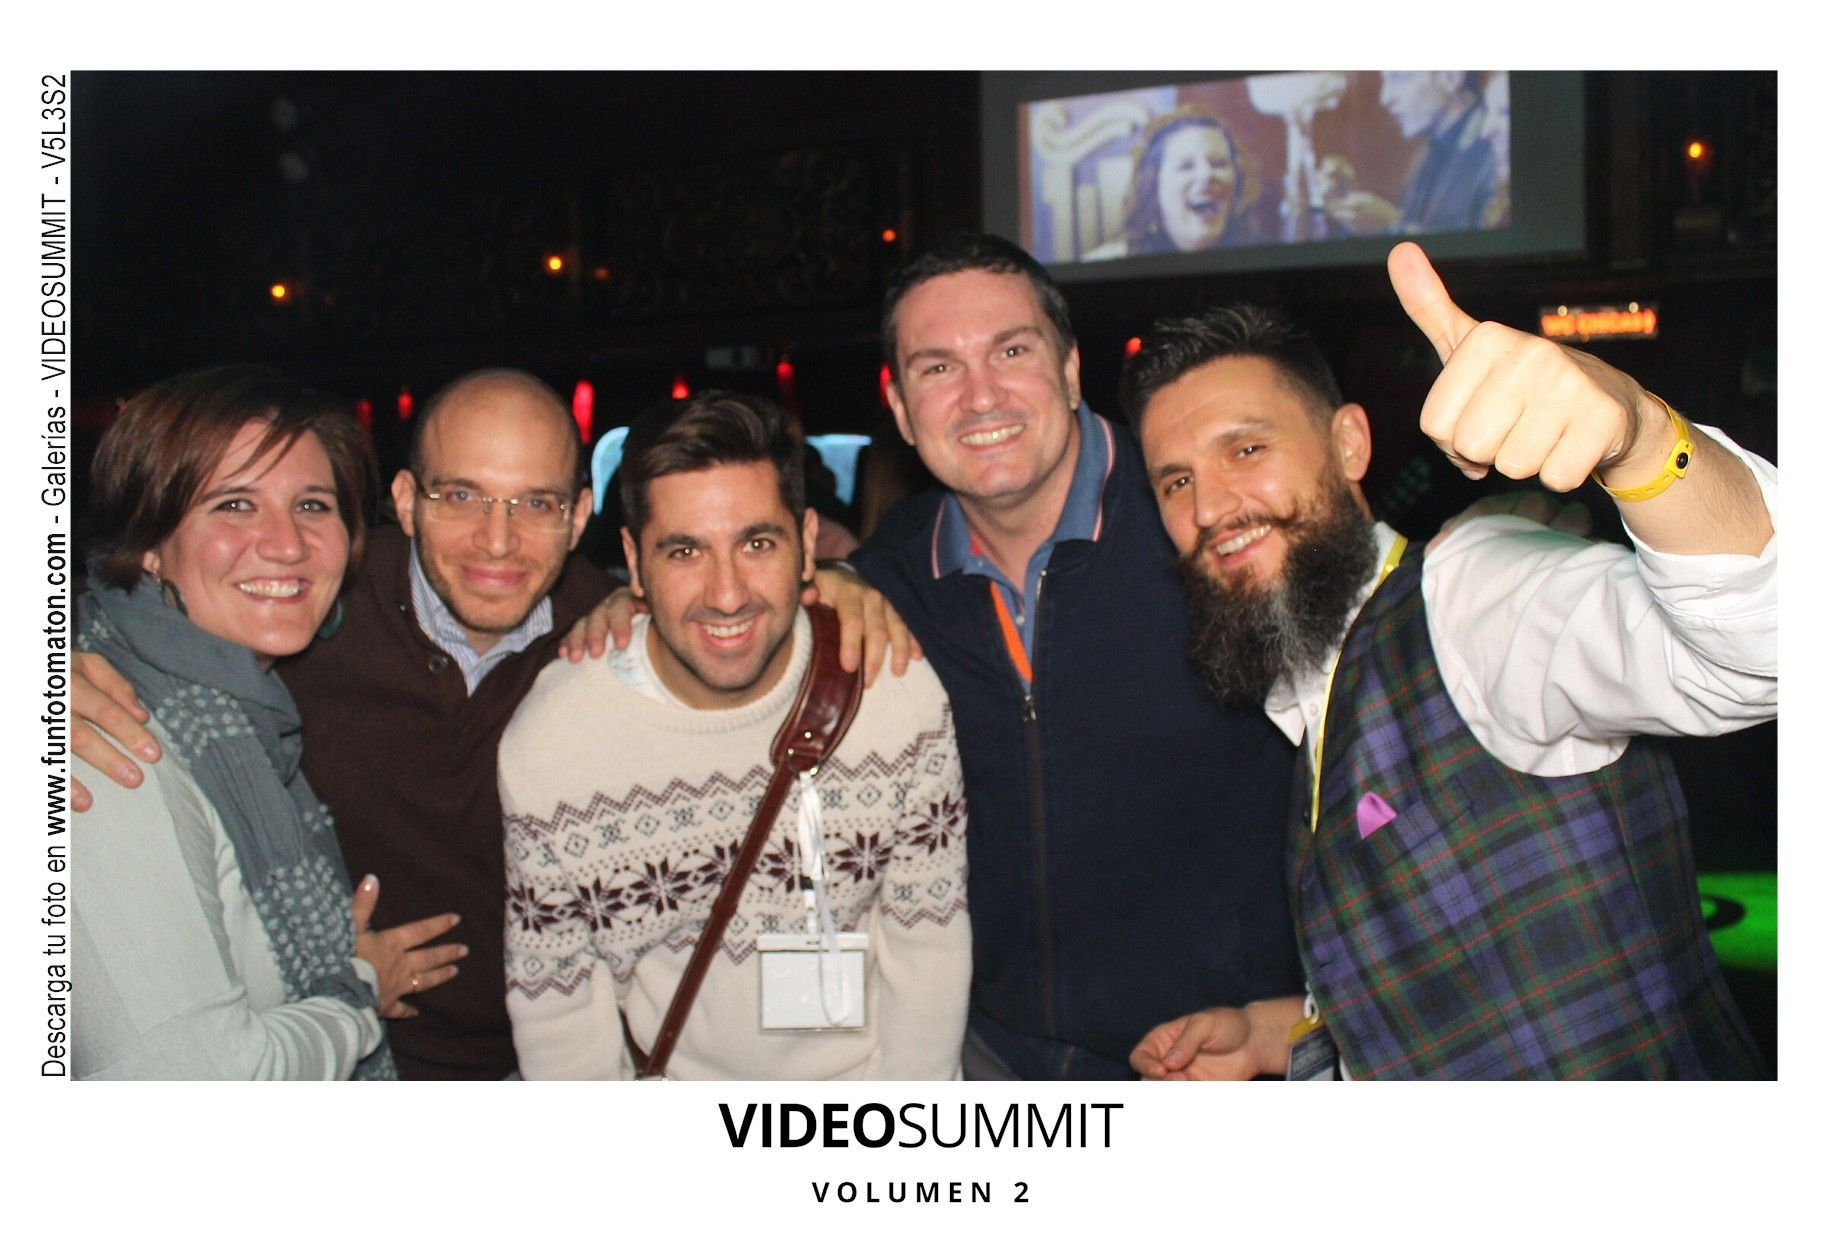 videosummit-vol2-club-party-011